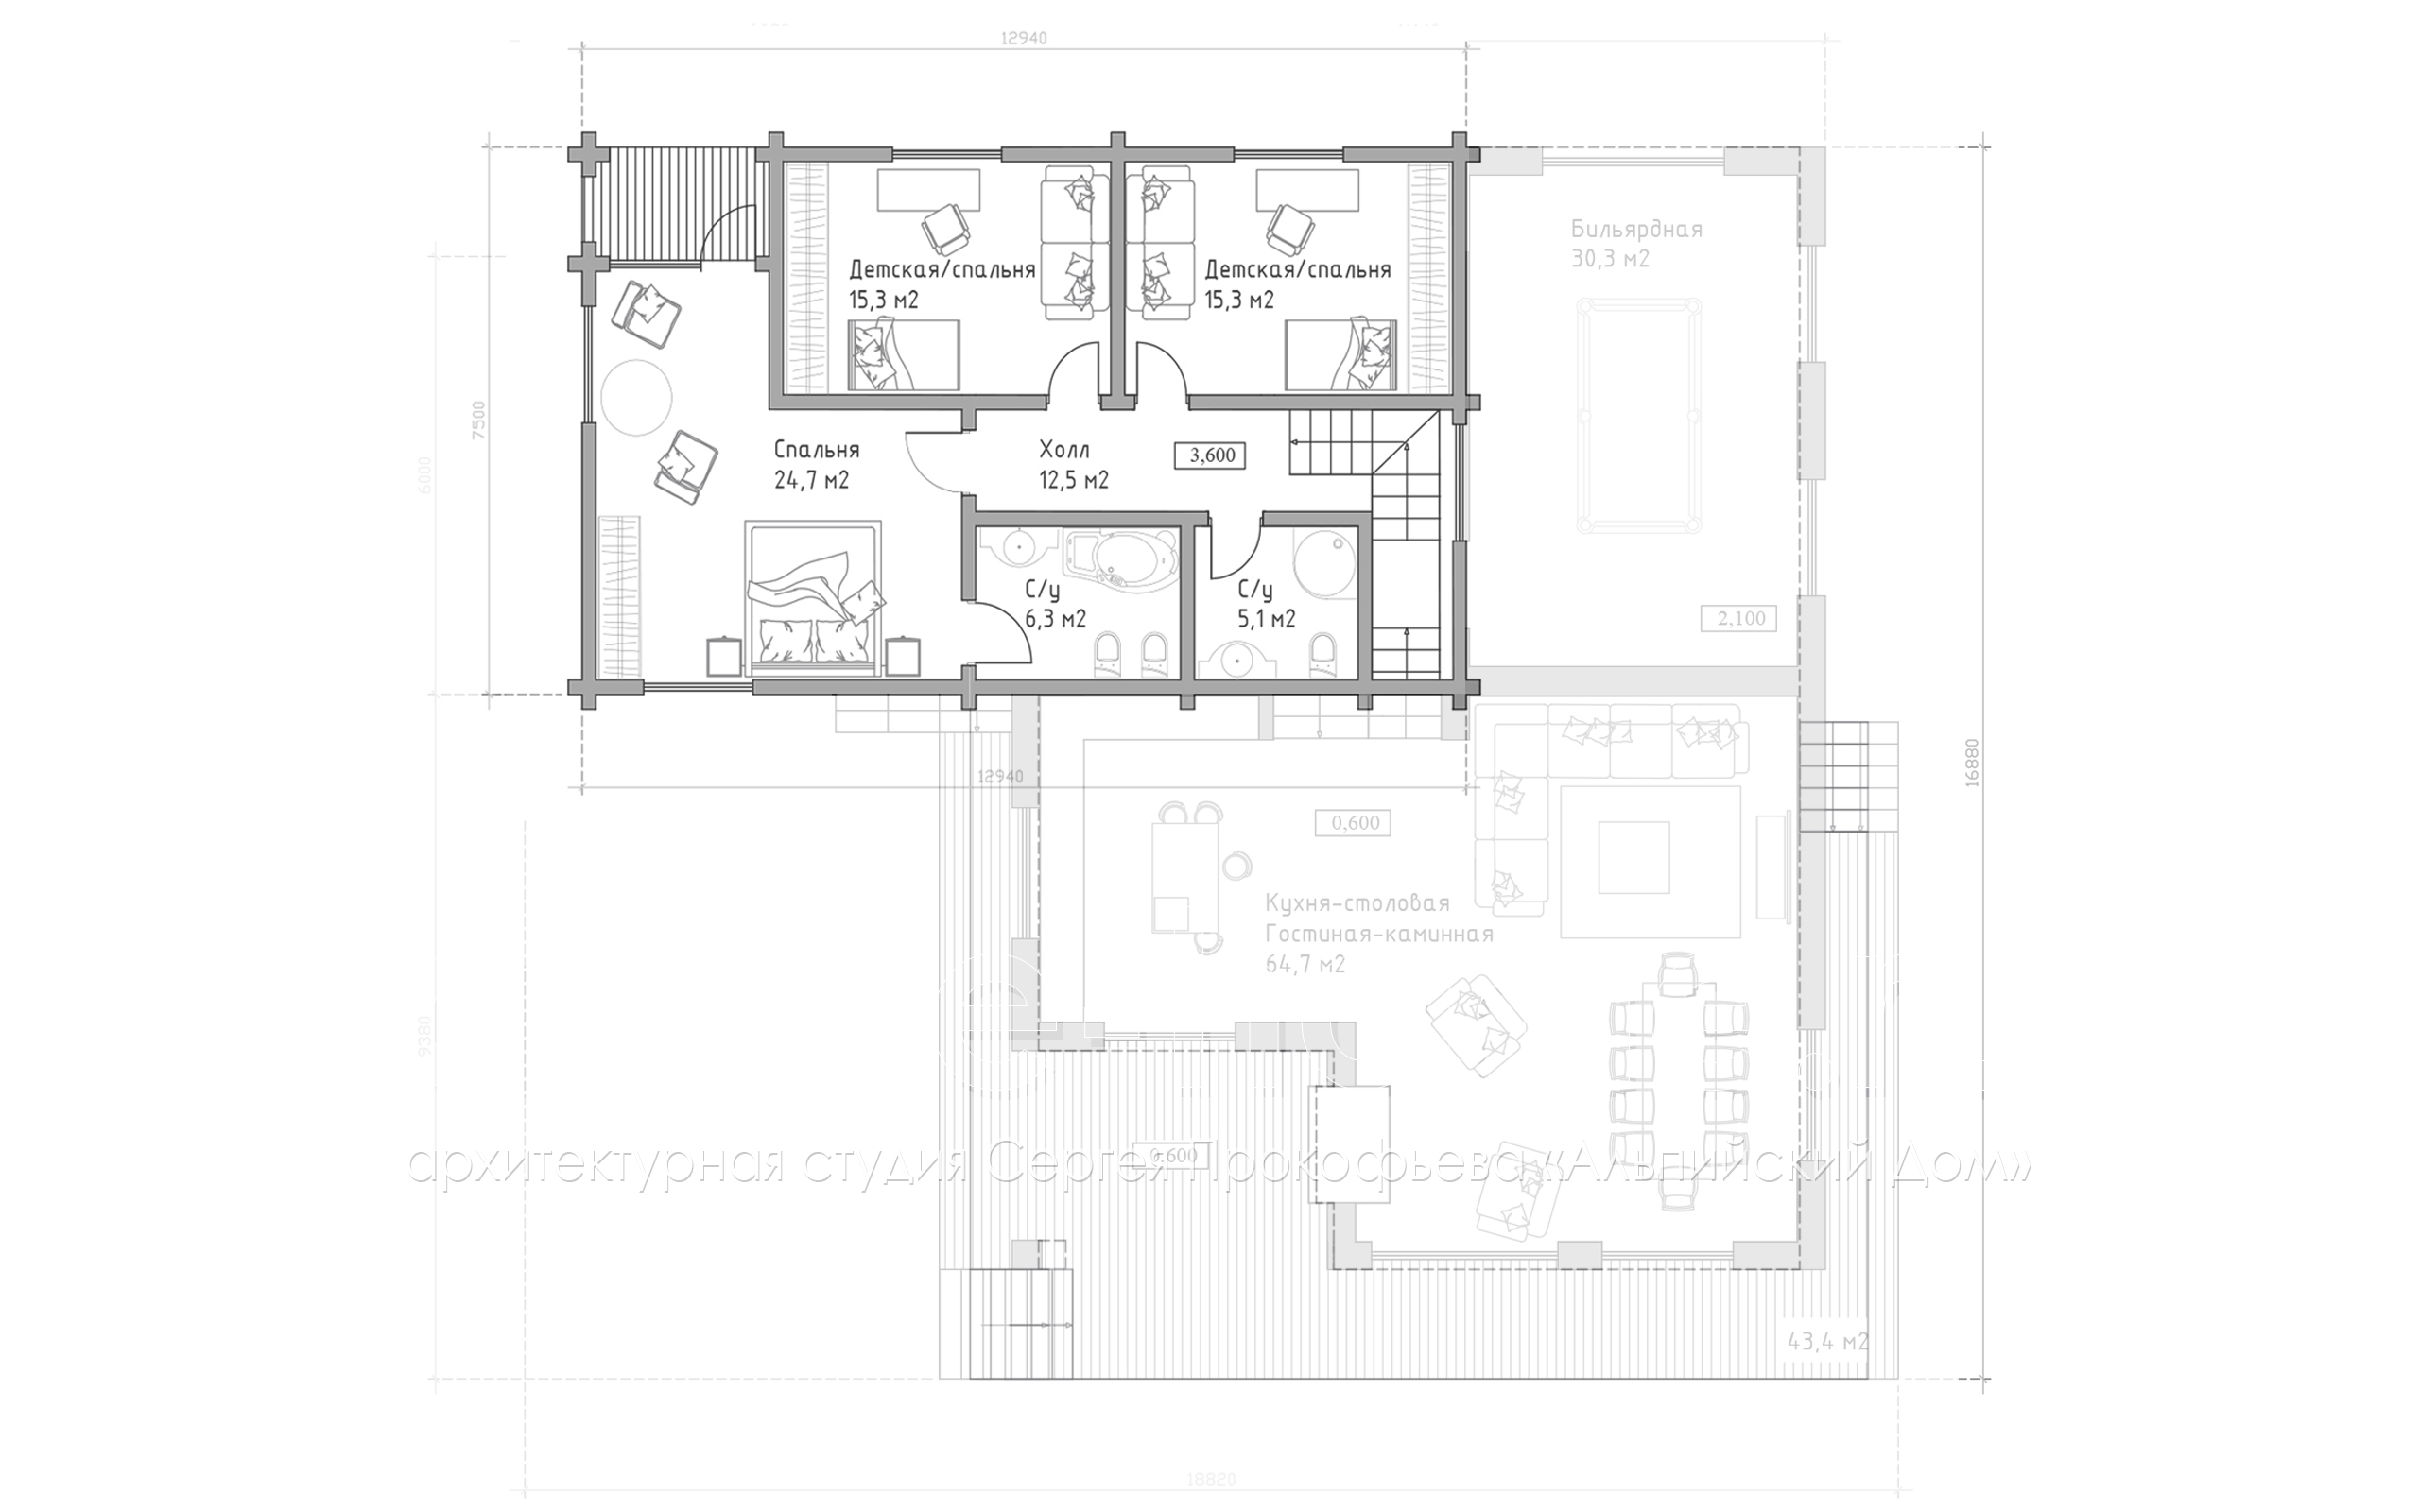 ШАЛЕ КАТРИН план 2-го этажа